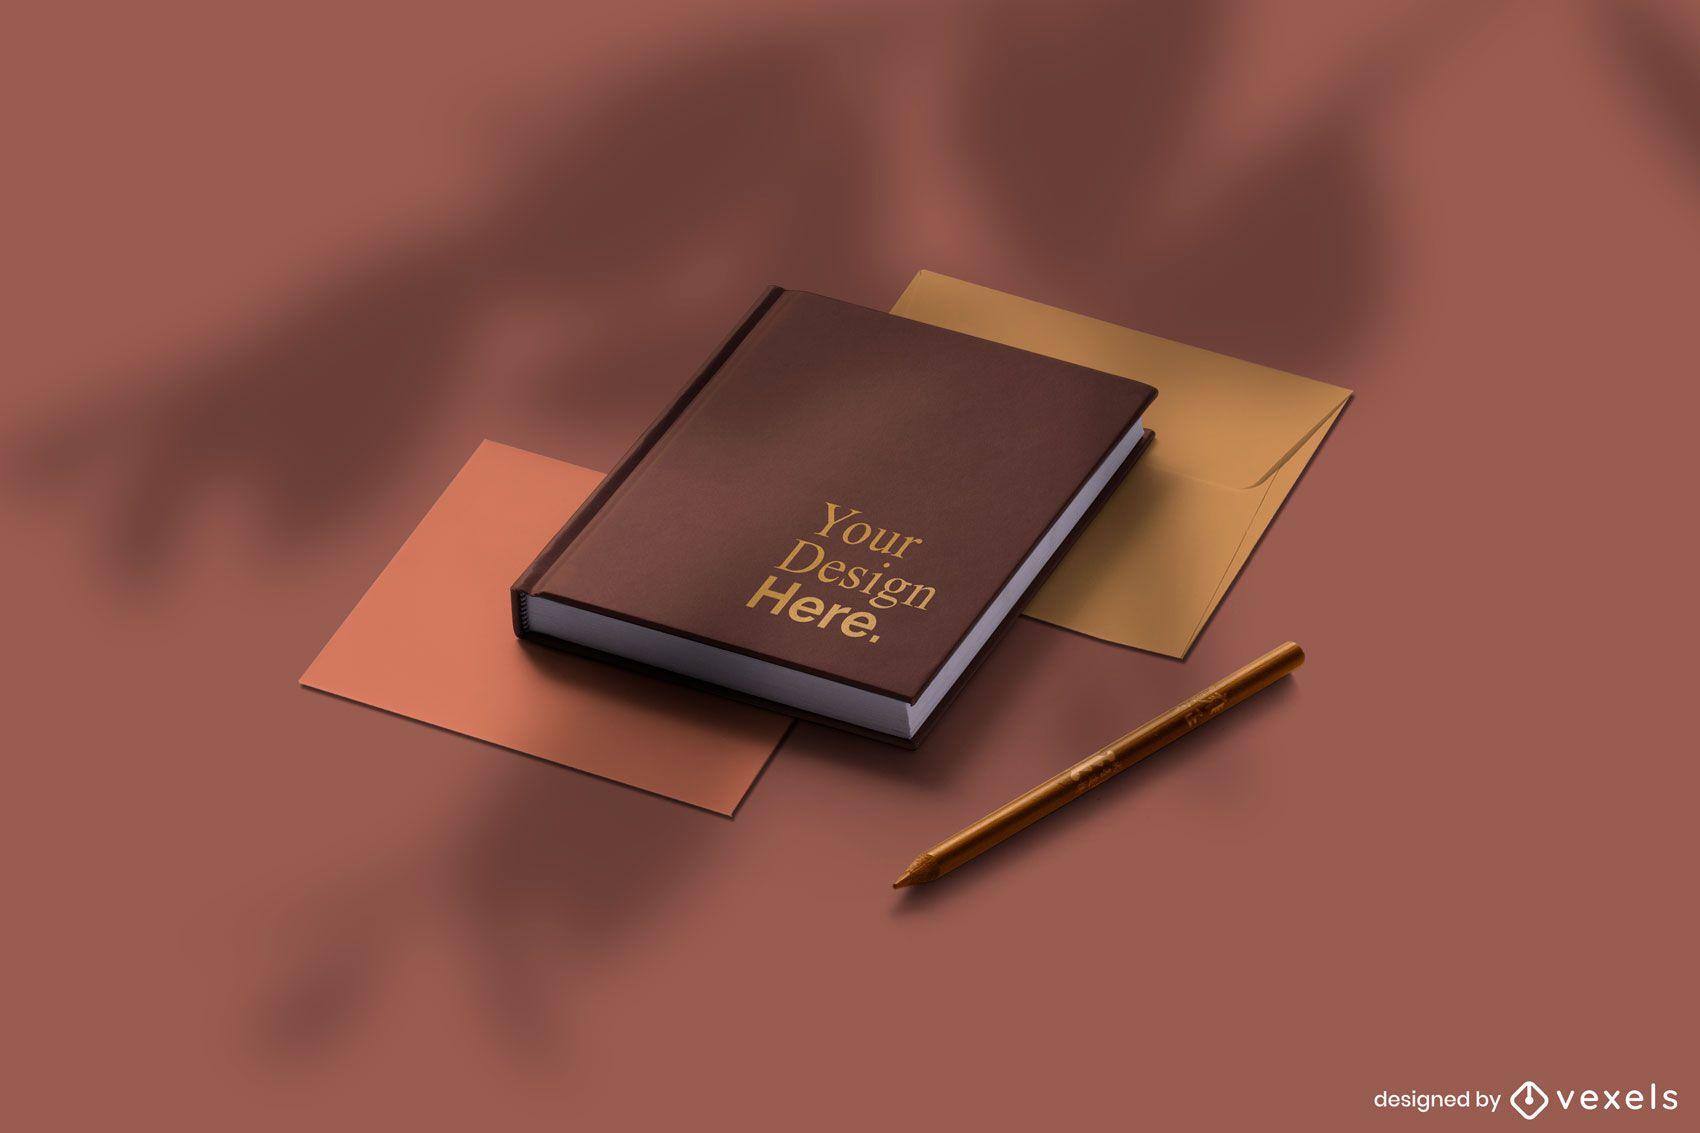 Conjunto de maquete de papelaria para notebook